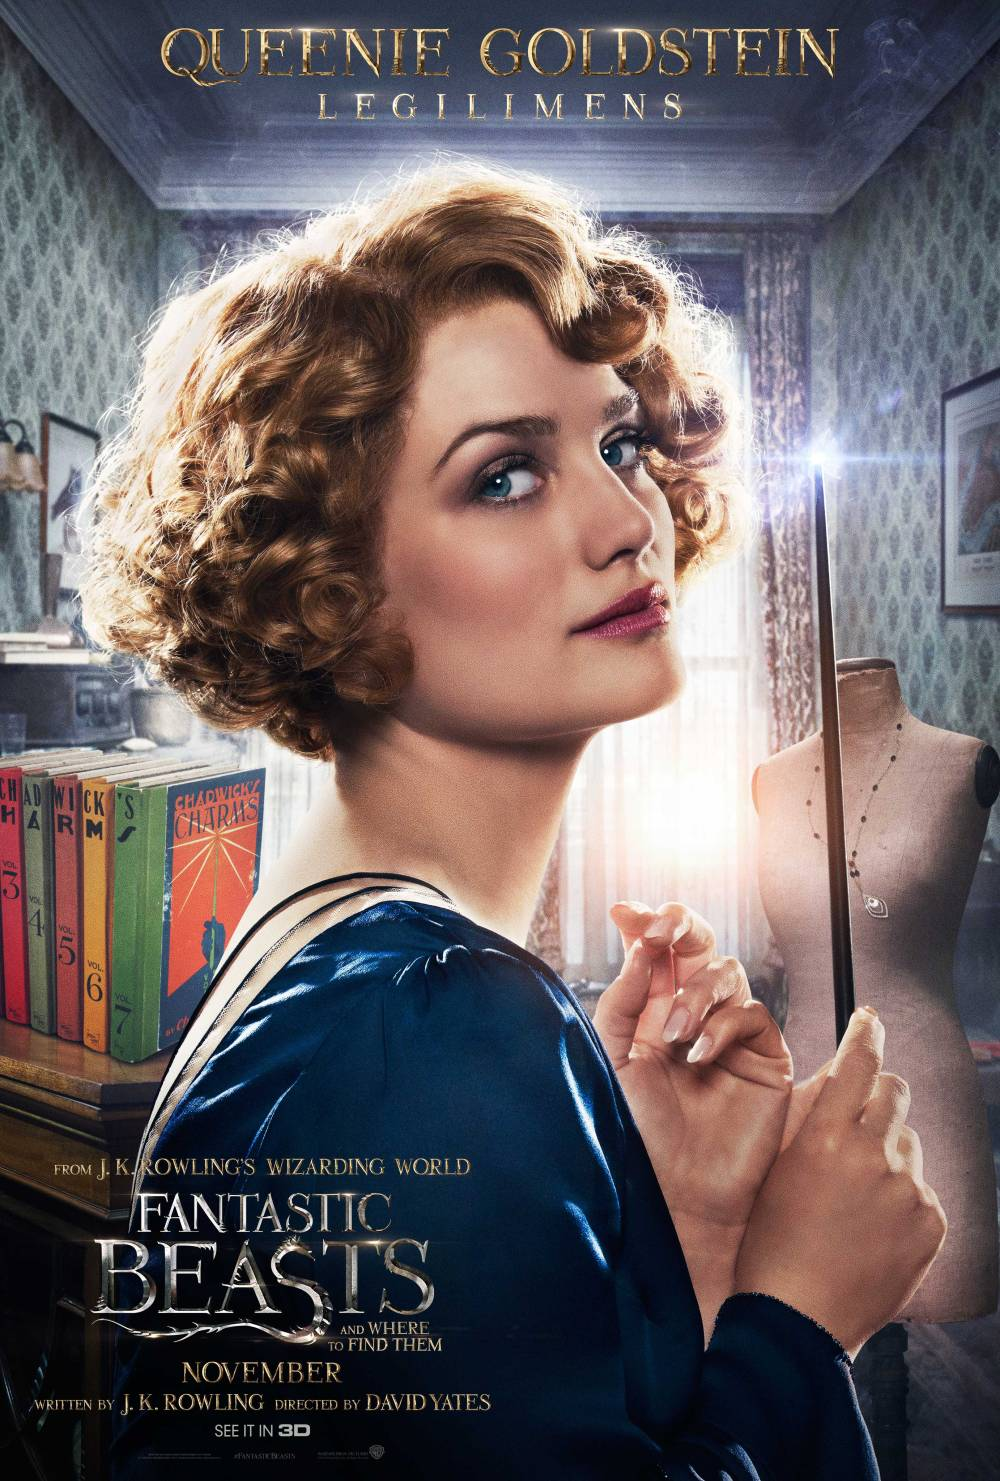 Fantastic Beasts - Queenie Goldstein Poster.png